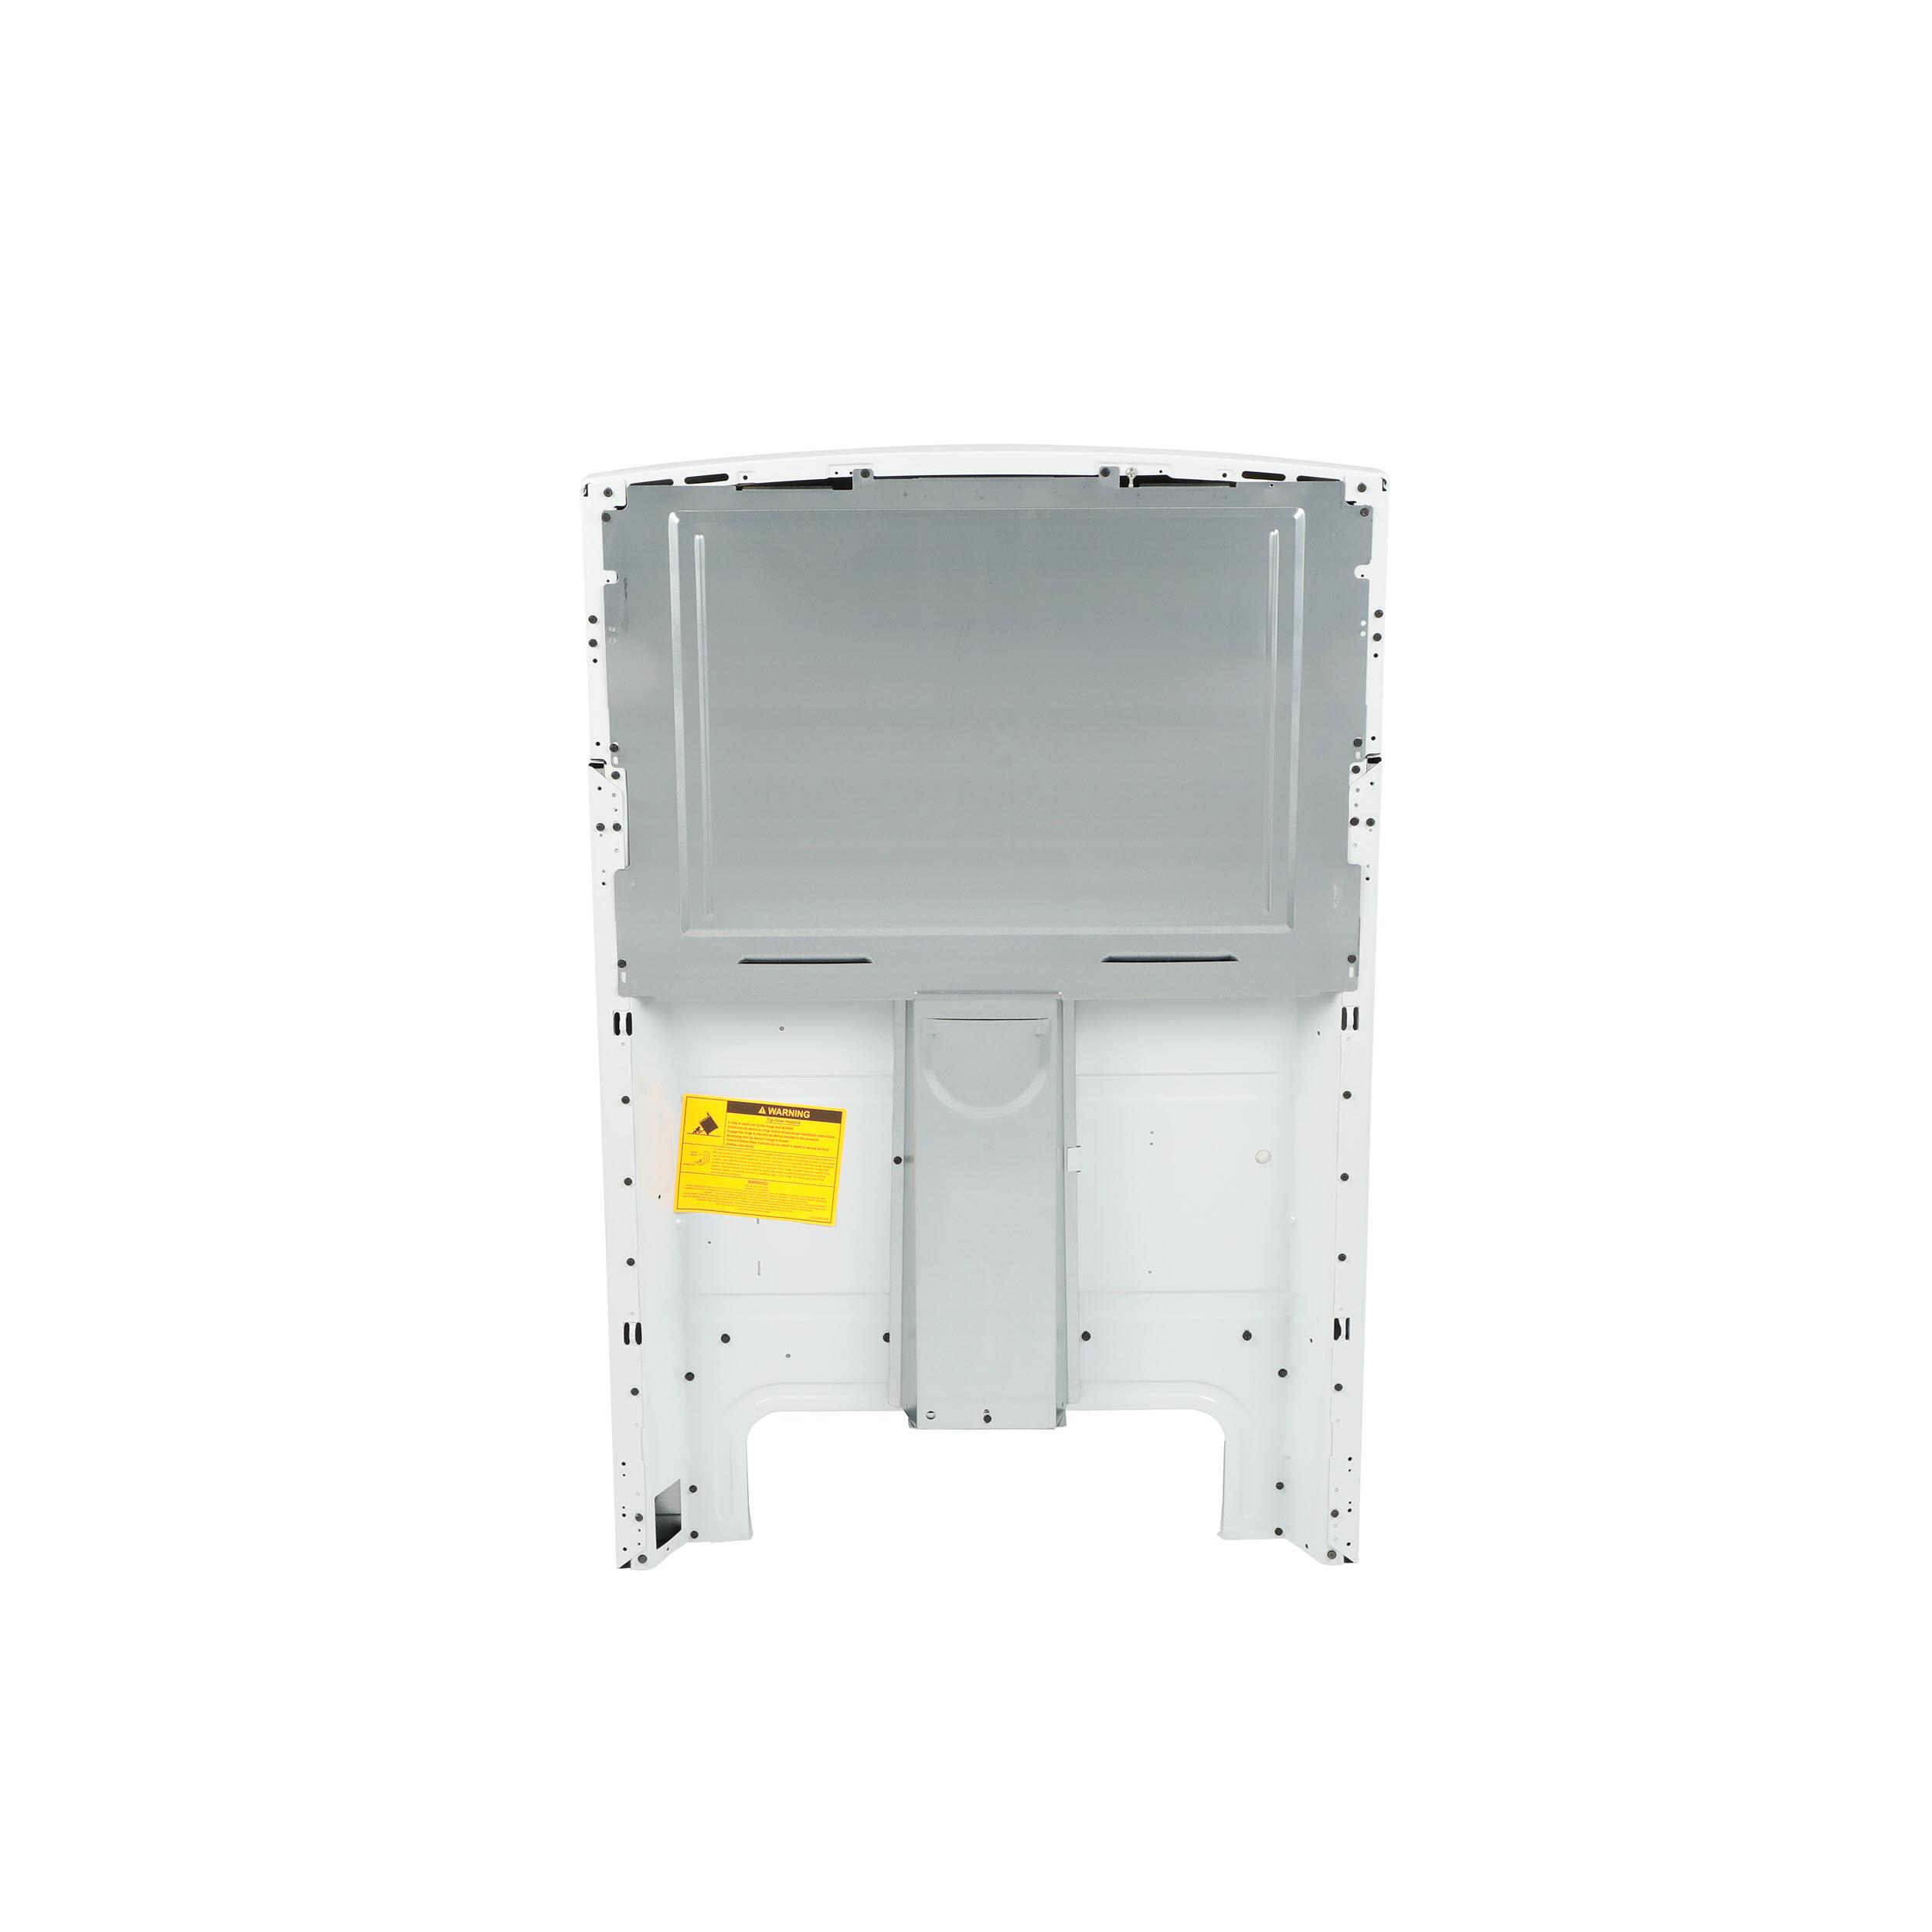 "Model: JBS160DMWW | GE GE® 30"" Free-Standing Electric Range"